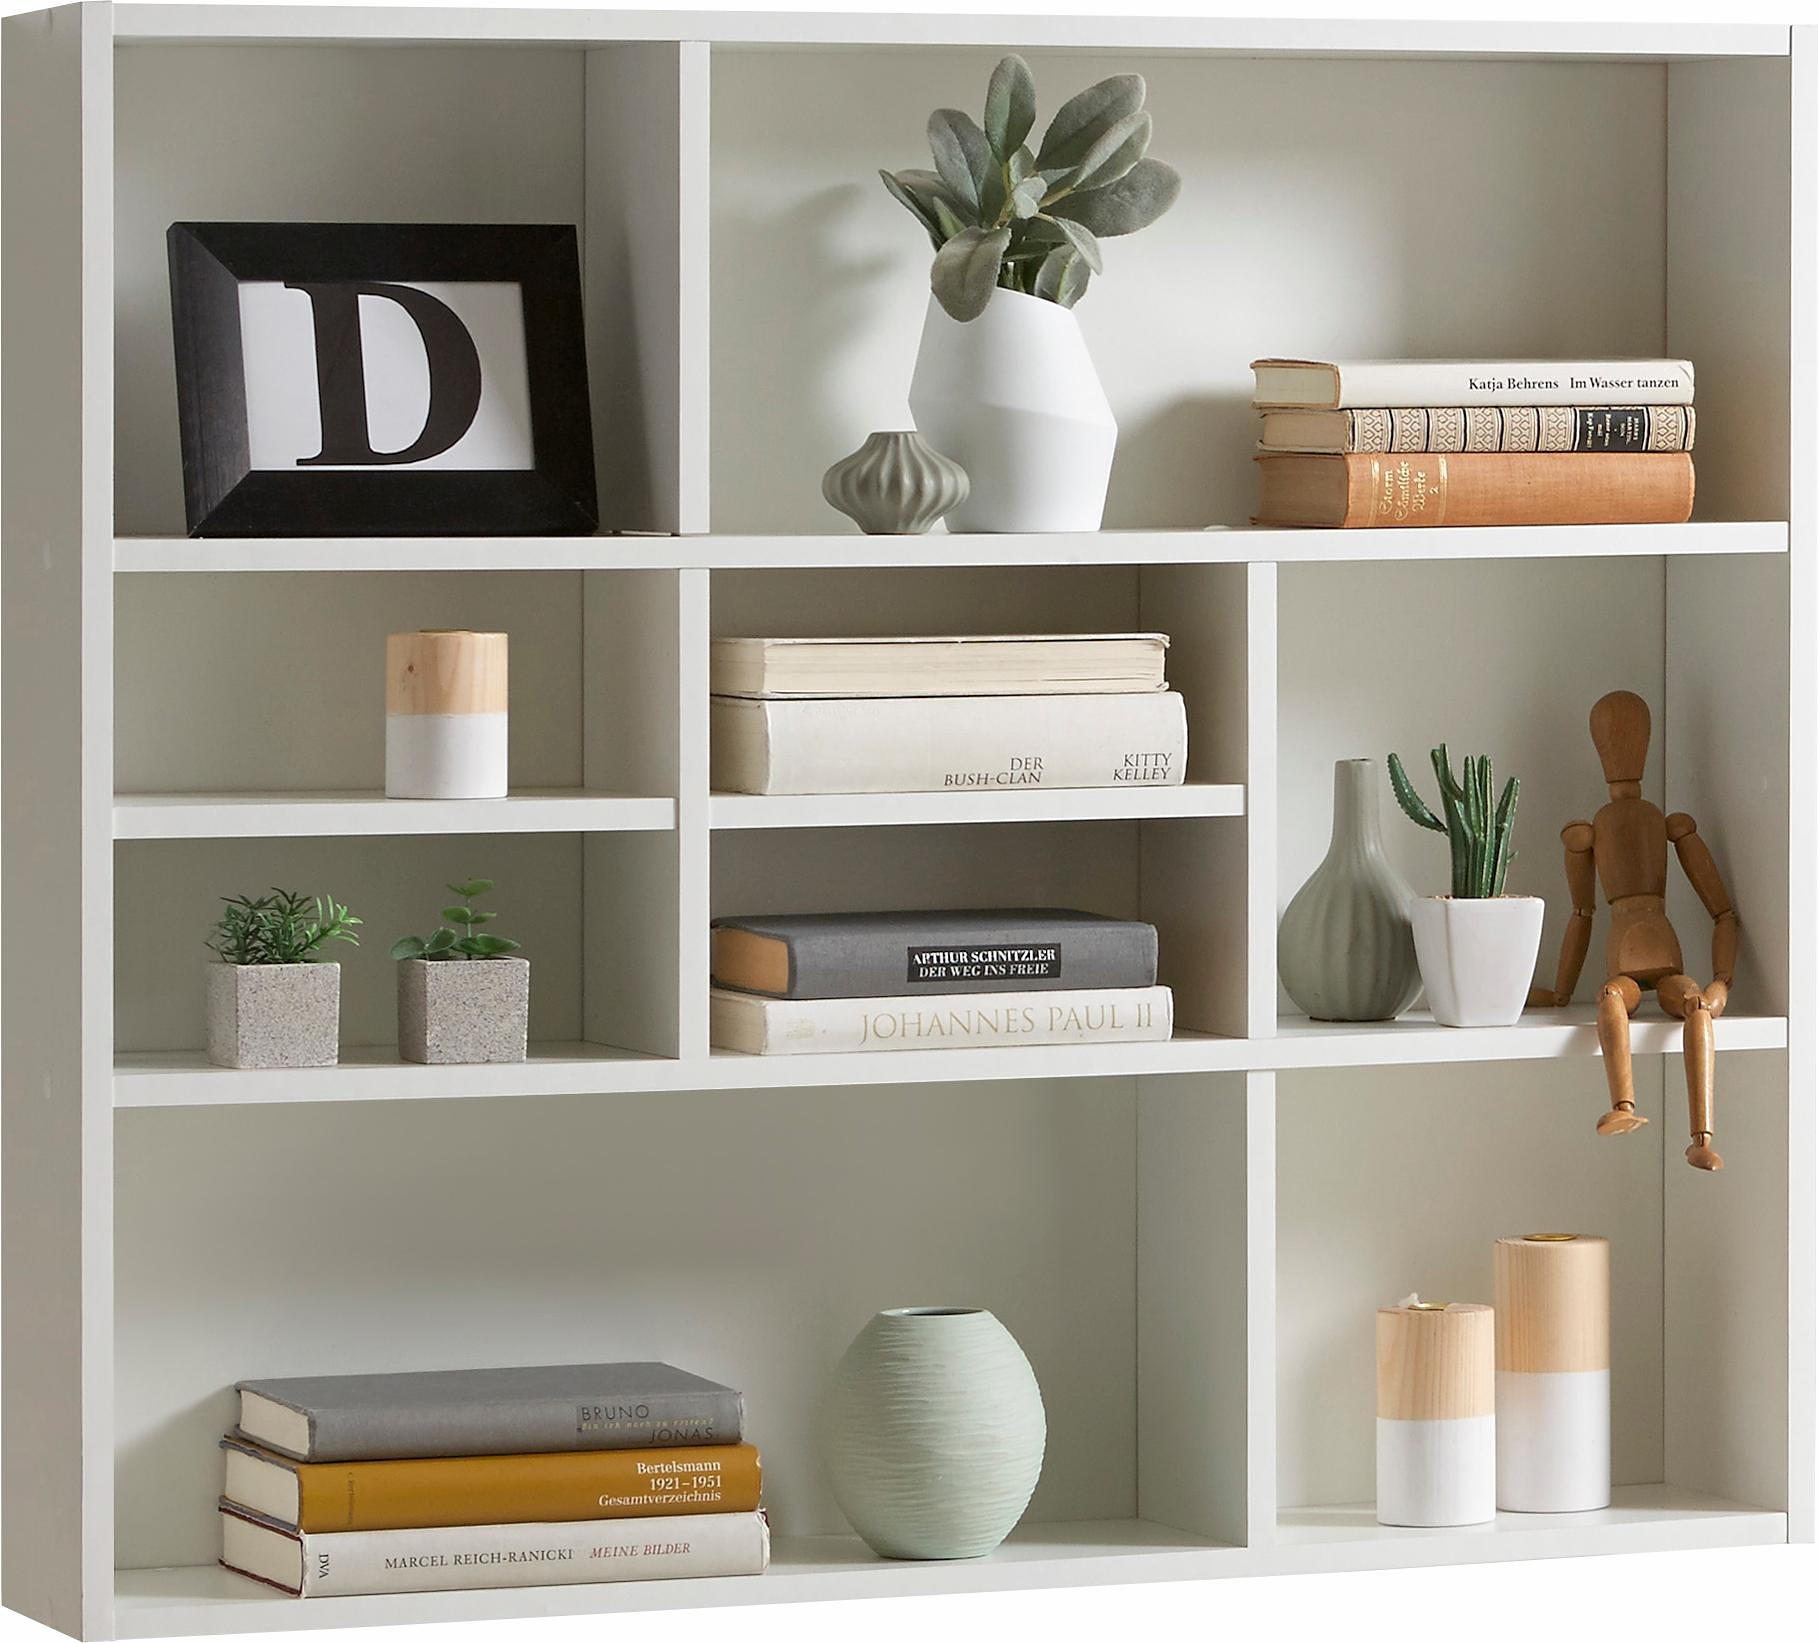 3 delig boekenkast skagen boekenwand met ladeset 3 delig home affaire open kast billie breedte 1735 cm home affaire boekenkast konrad